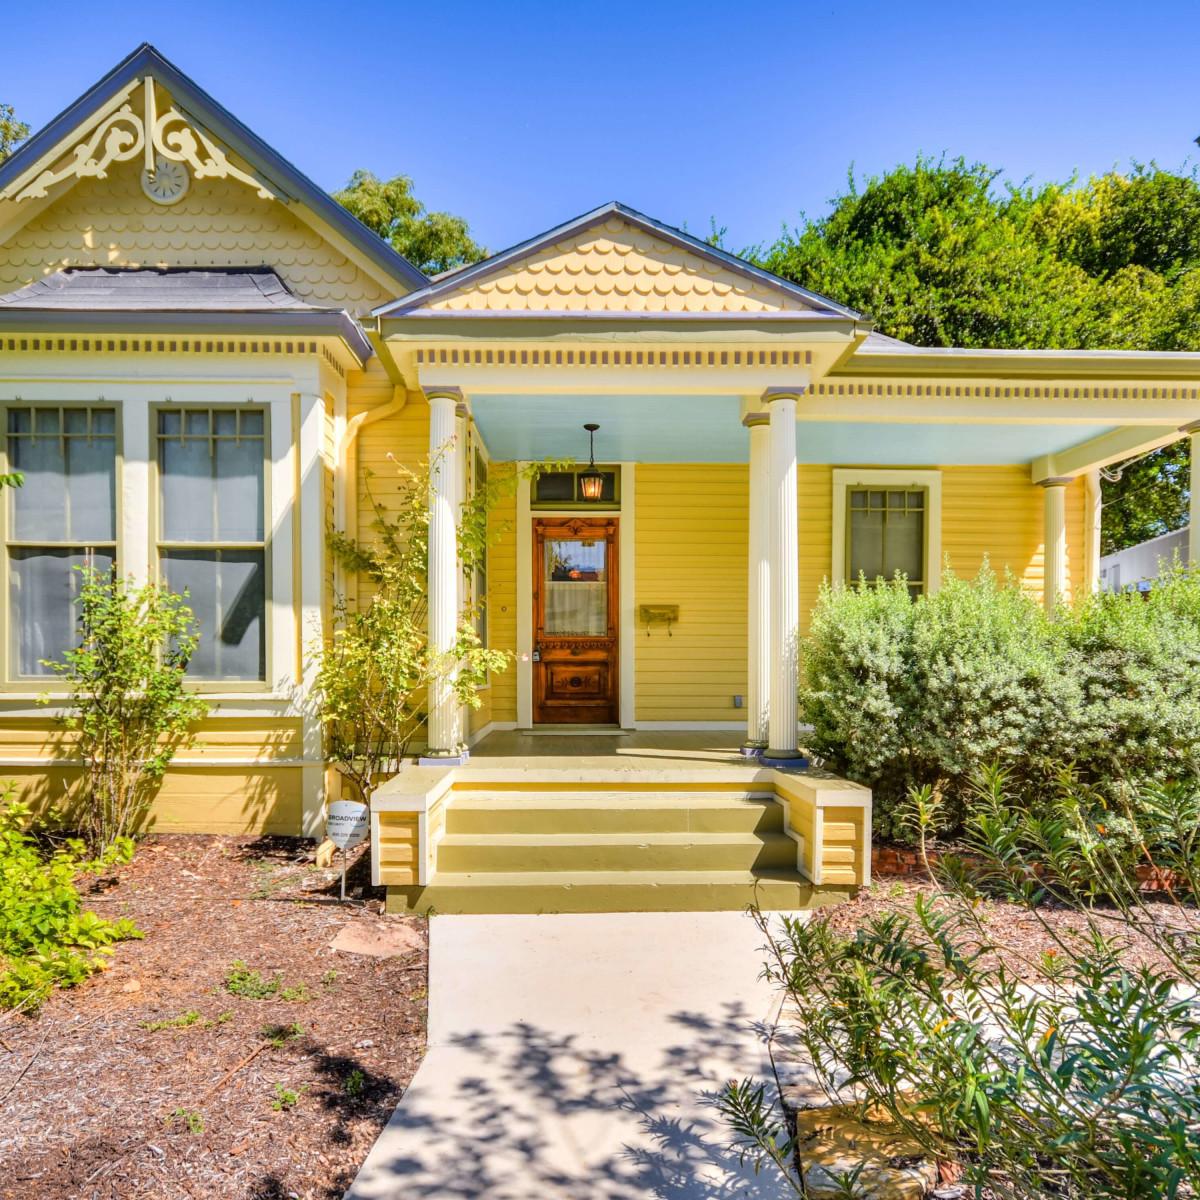 422 Mission San Antonio house for sale